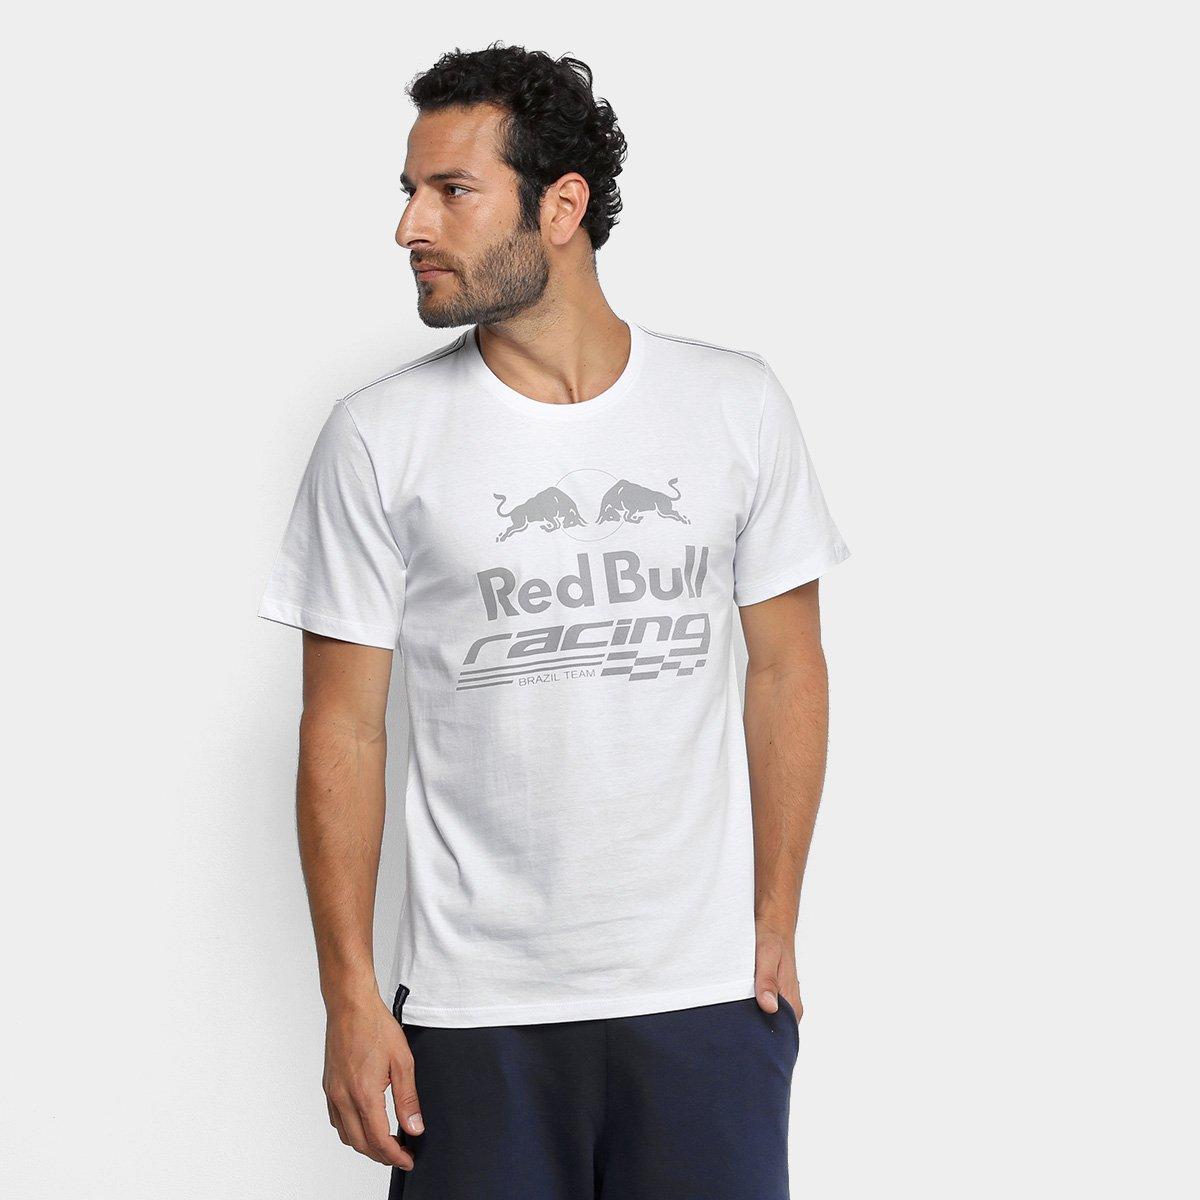 a3496c71da5f8 Camiseta Red Bull Racing Estampa Contraste Masculina - Branco - Compre  Agora